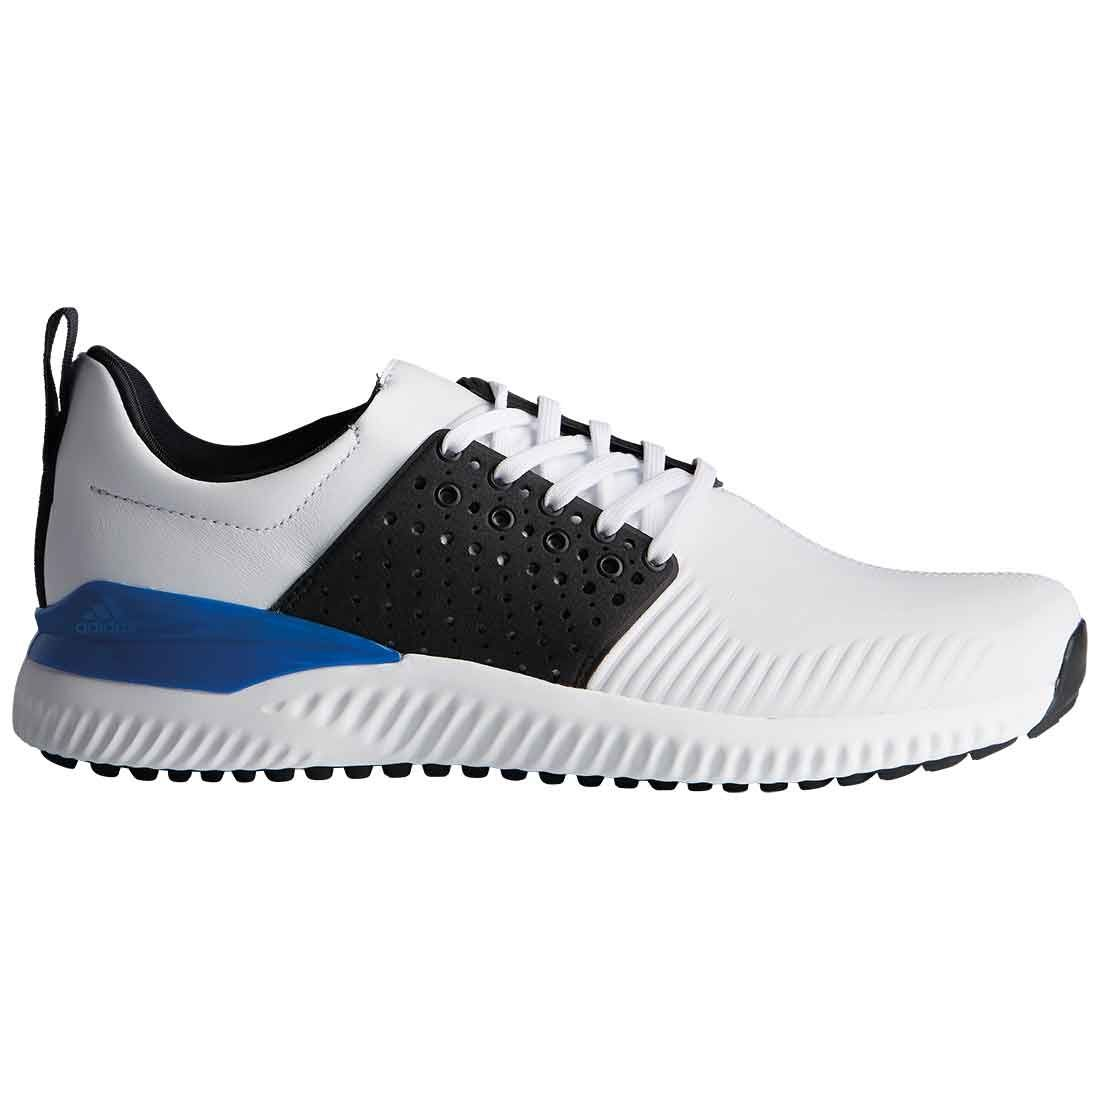 Arco iris carrera batalla  Buy Adidas AdiCross Bounce Golf Shoes White/Black/Blue | Golf Discount